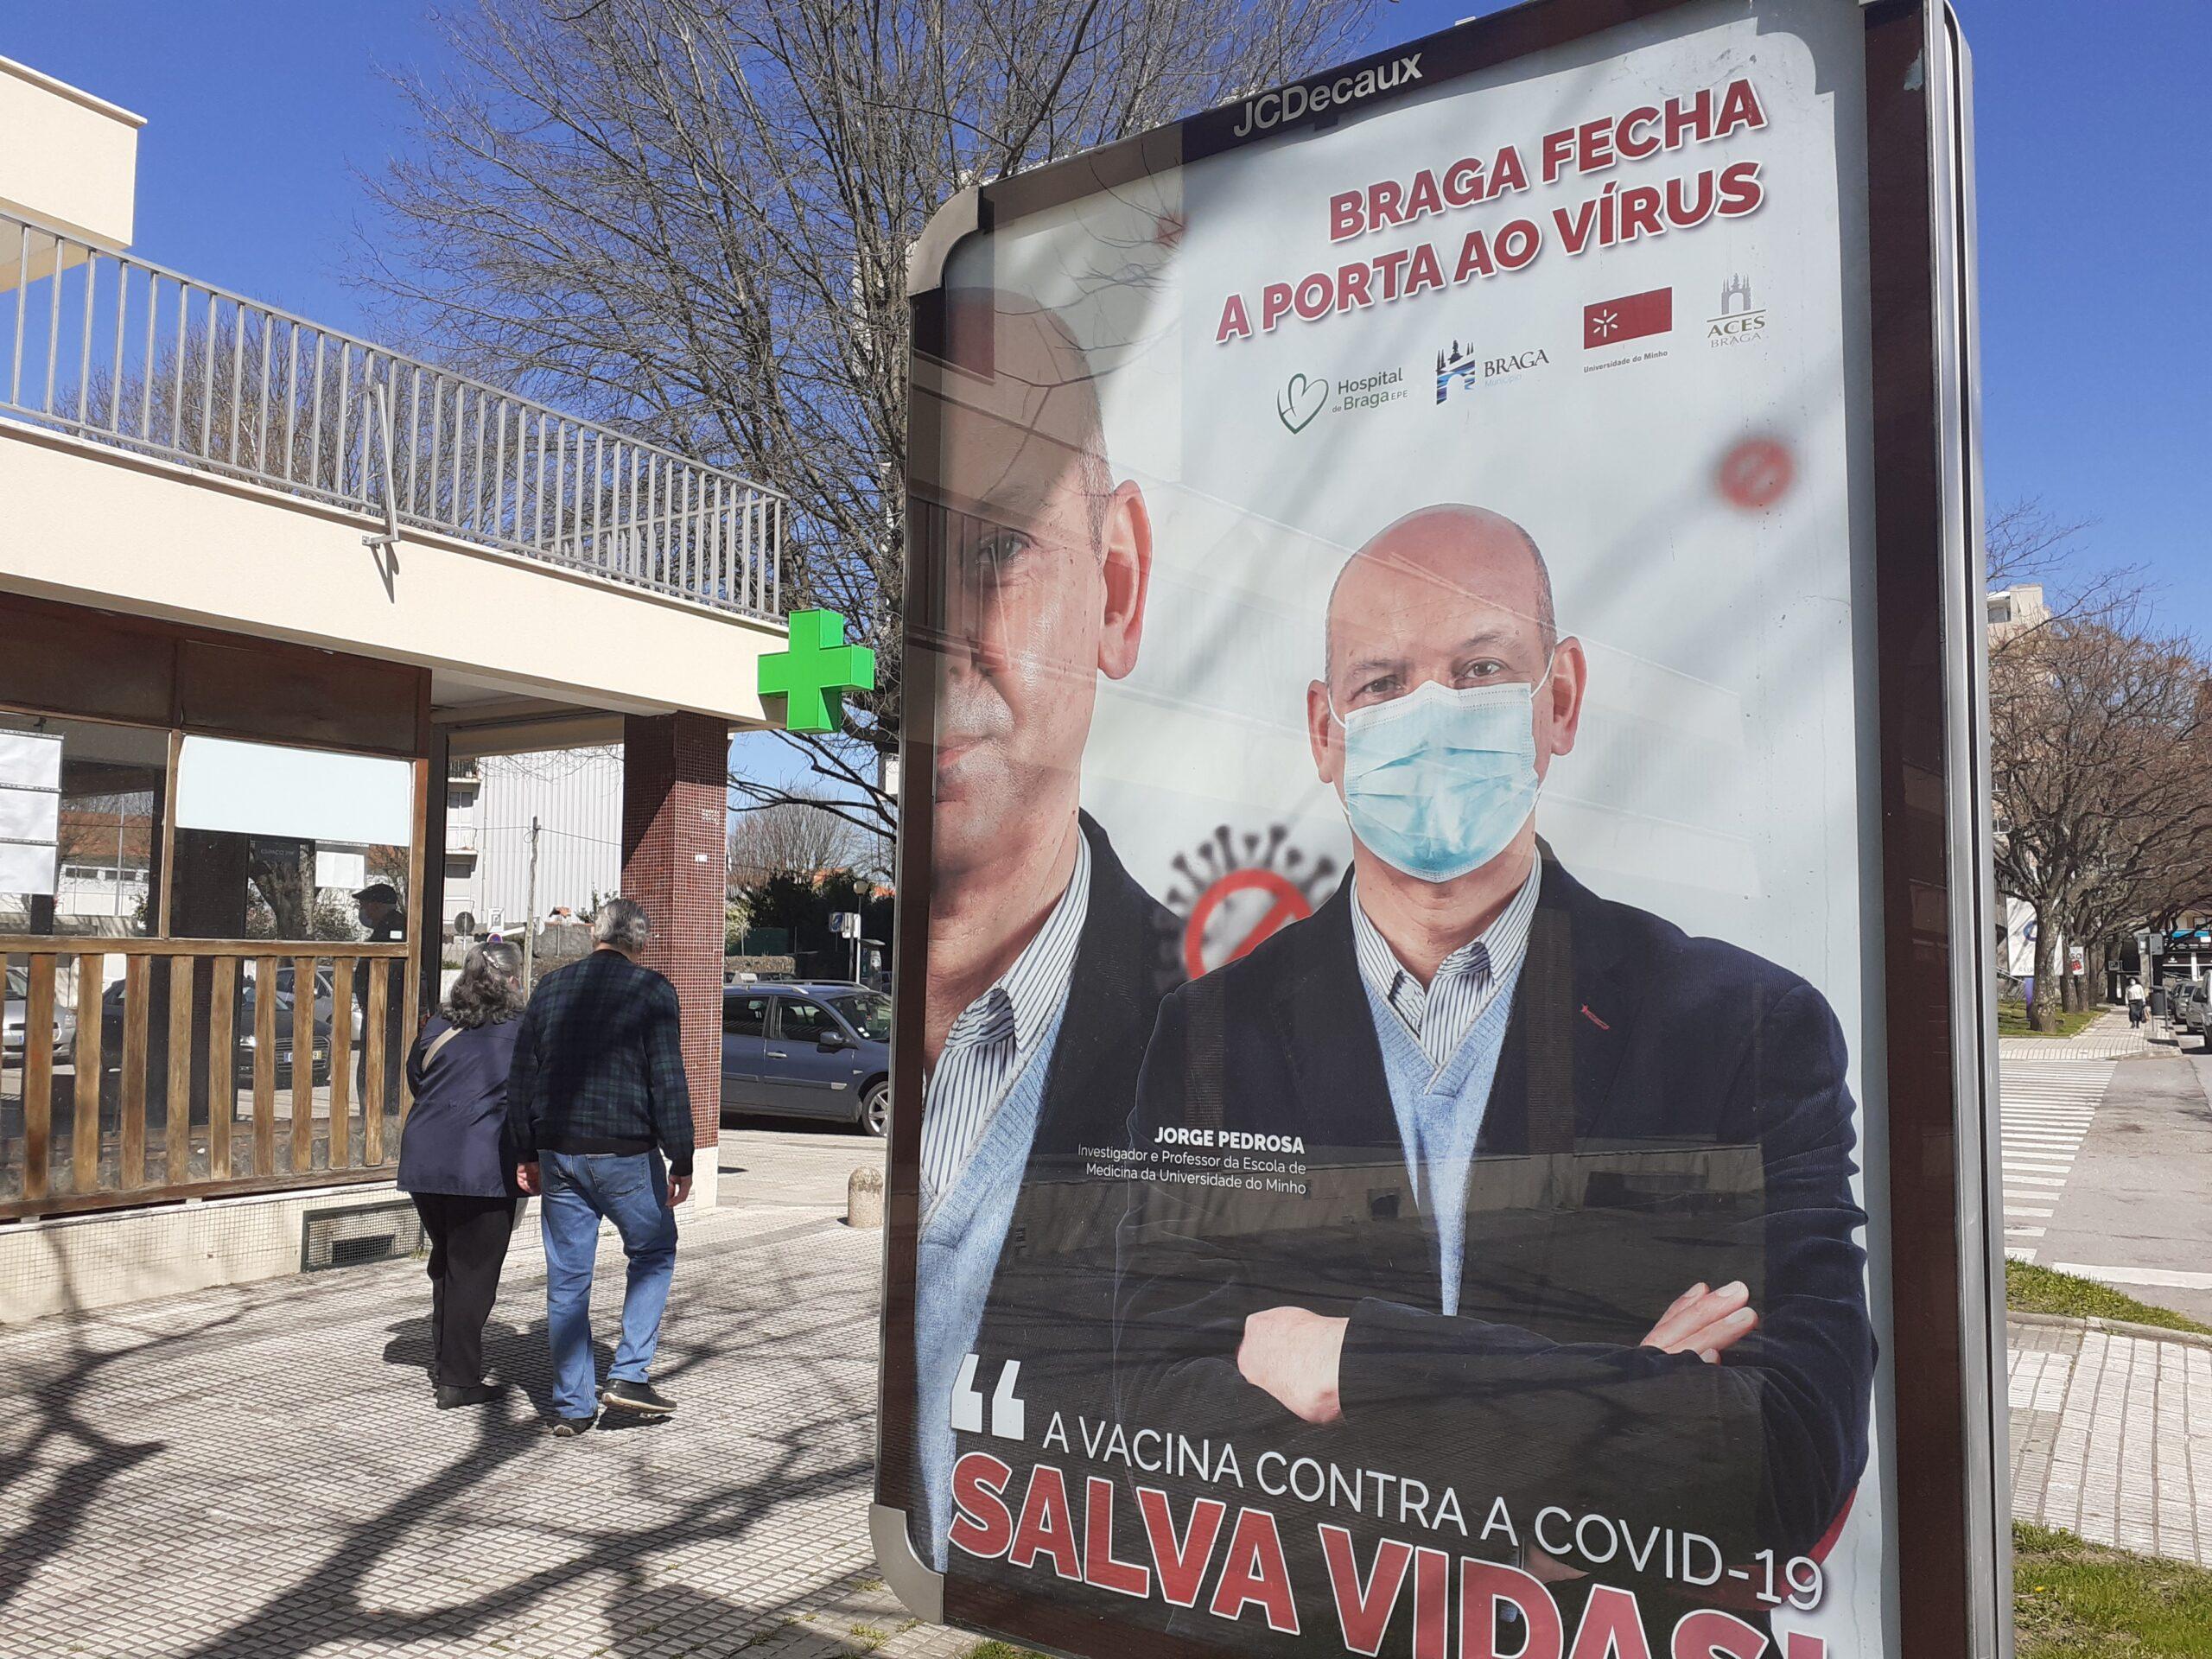 Todo o distrito de Braga continua em risco moderado de contágio por covid-19